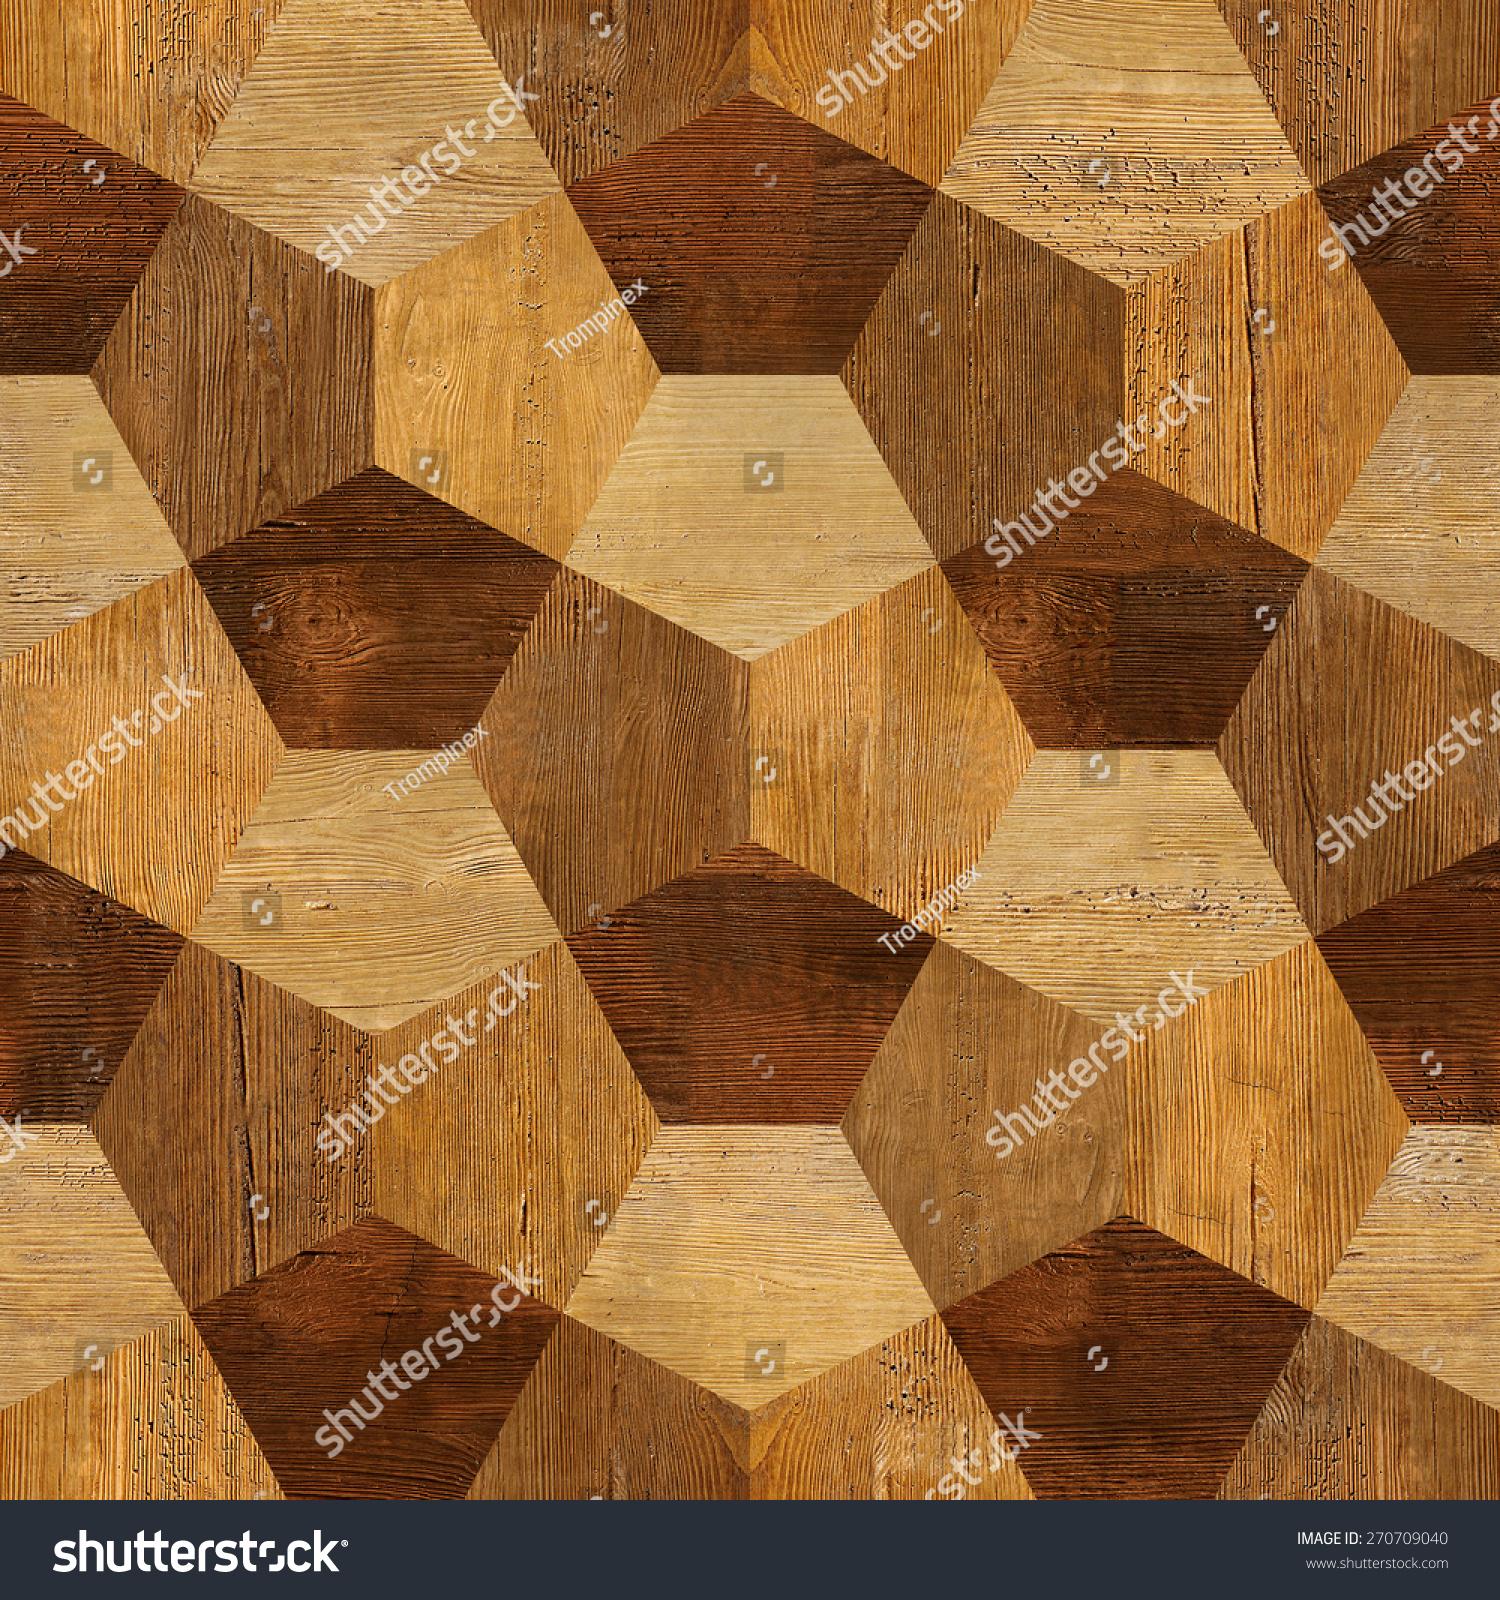 Abstract Decorative Blocks   Interior Wall Decor   Decorative Tiles    Seamless Background   Wood Texture